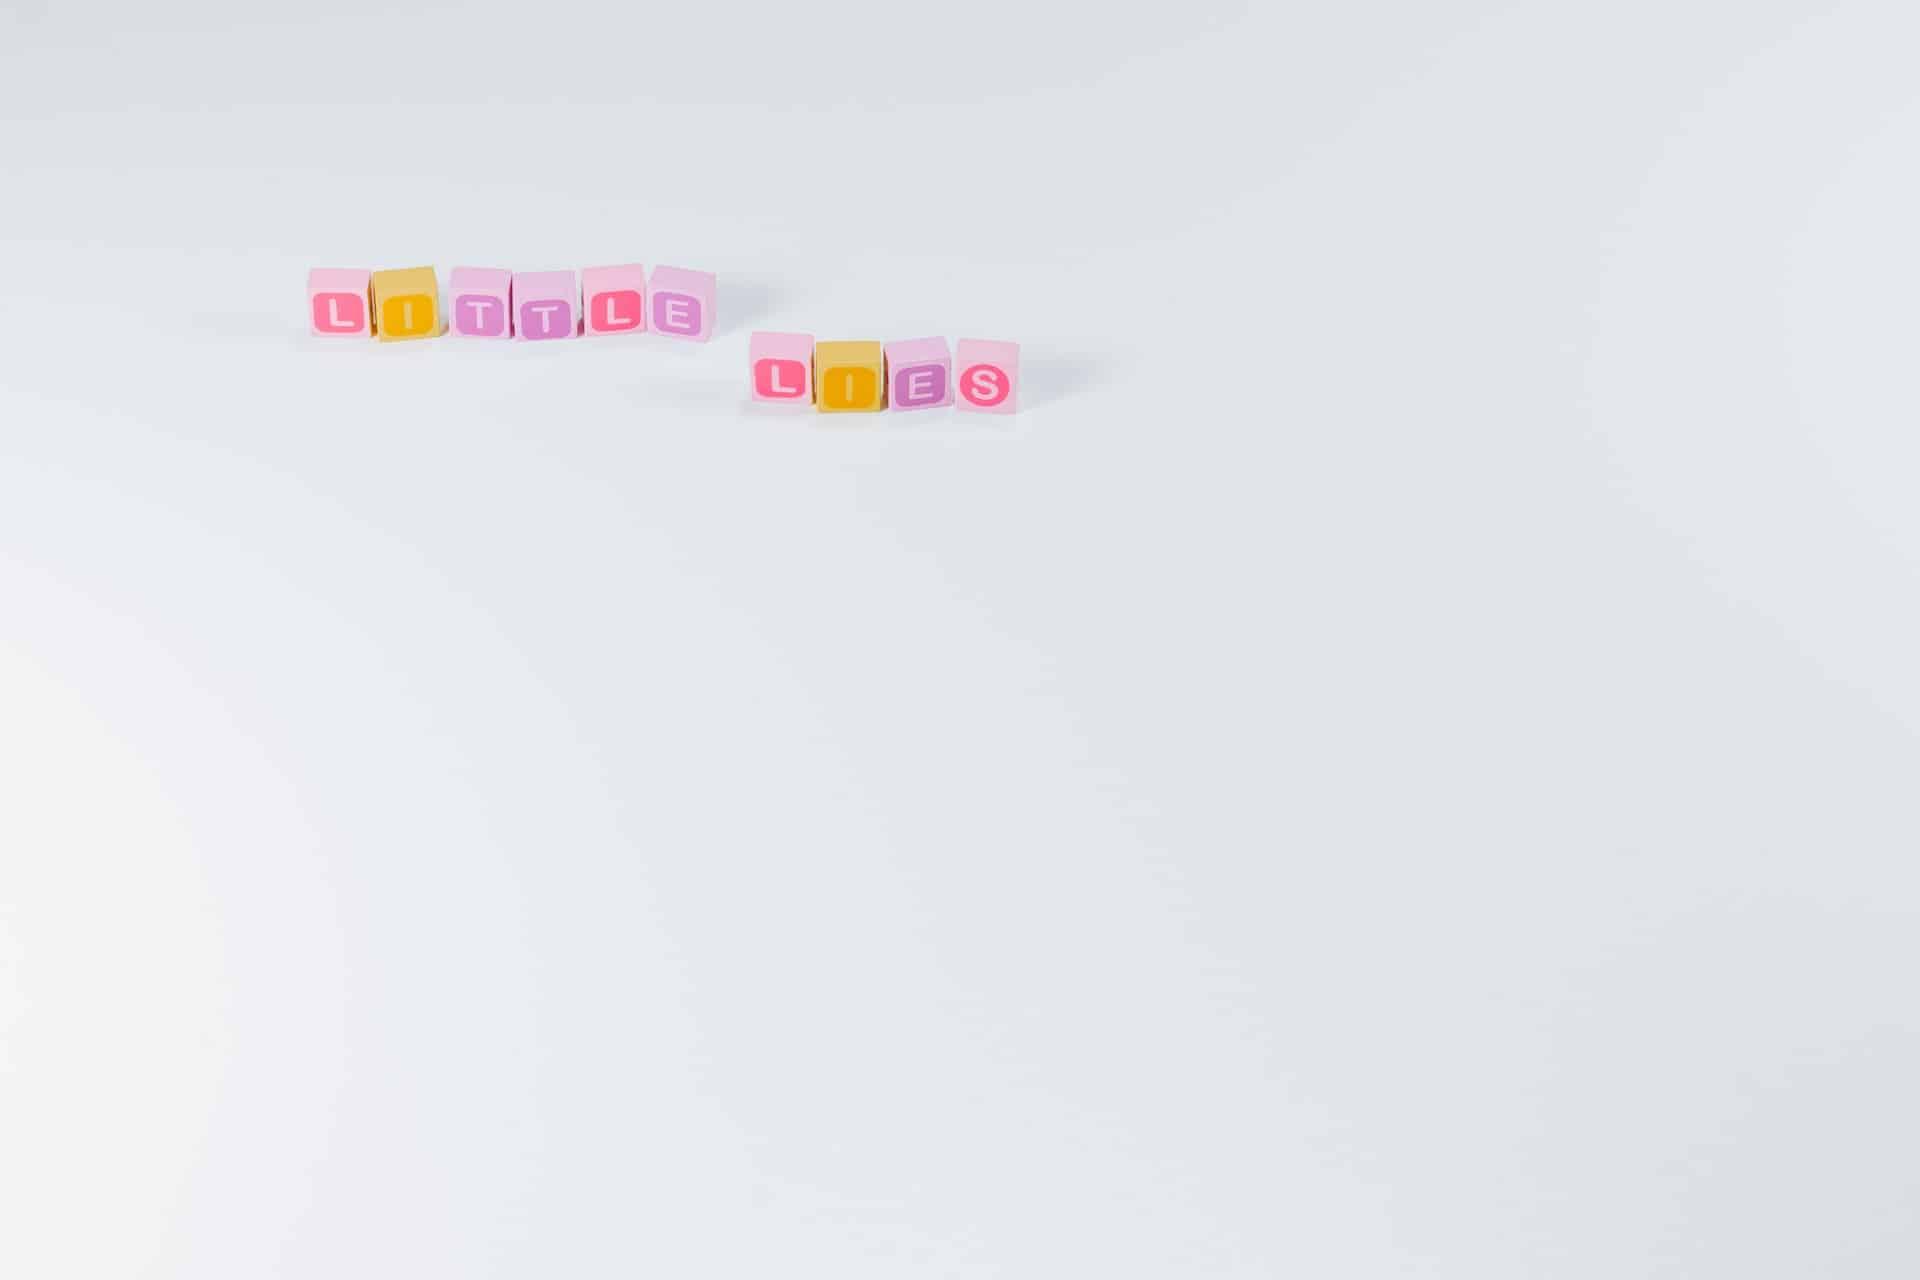 little lies caption made of letter blocks